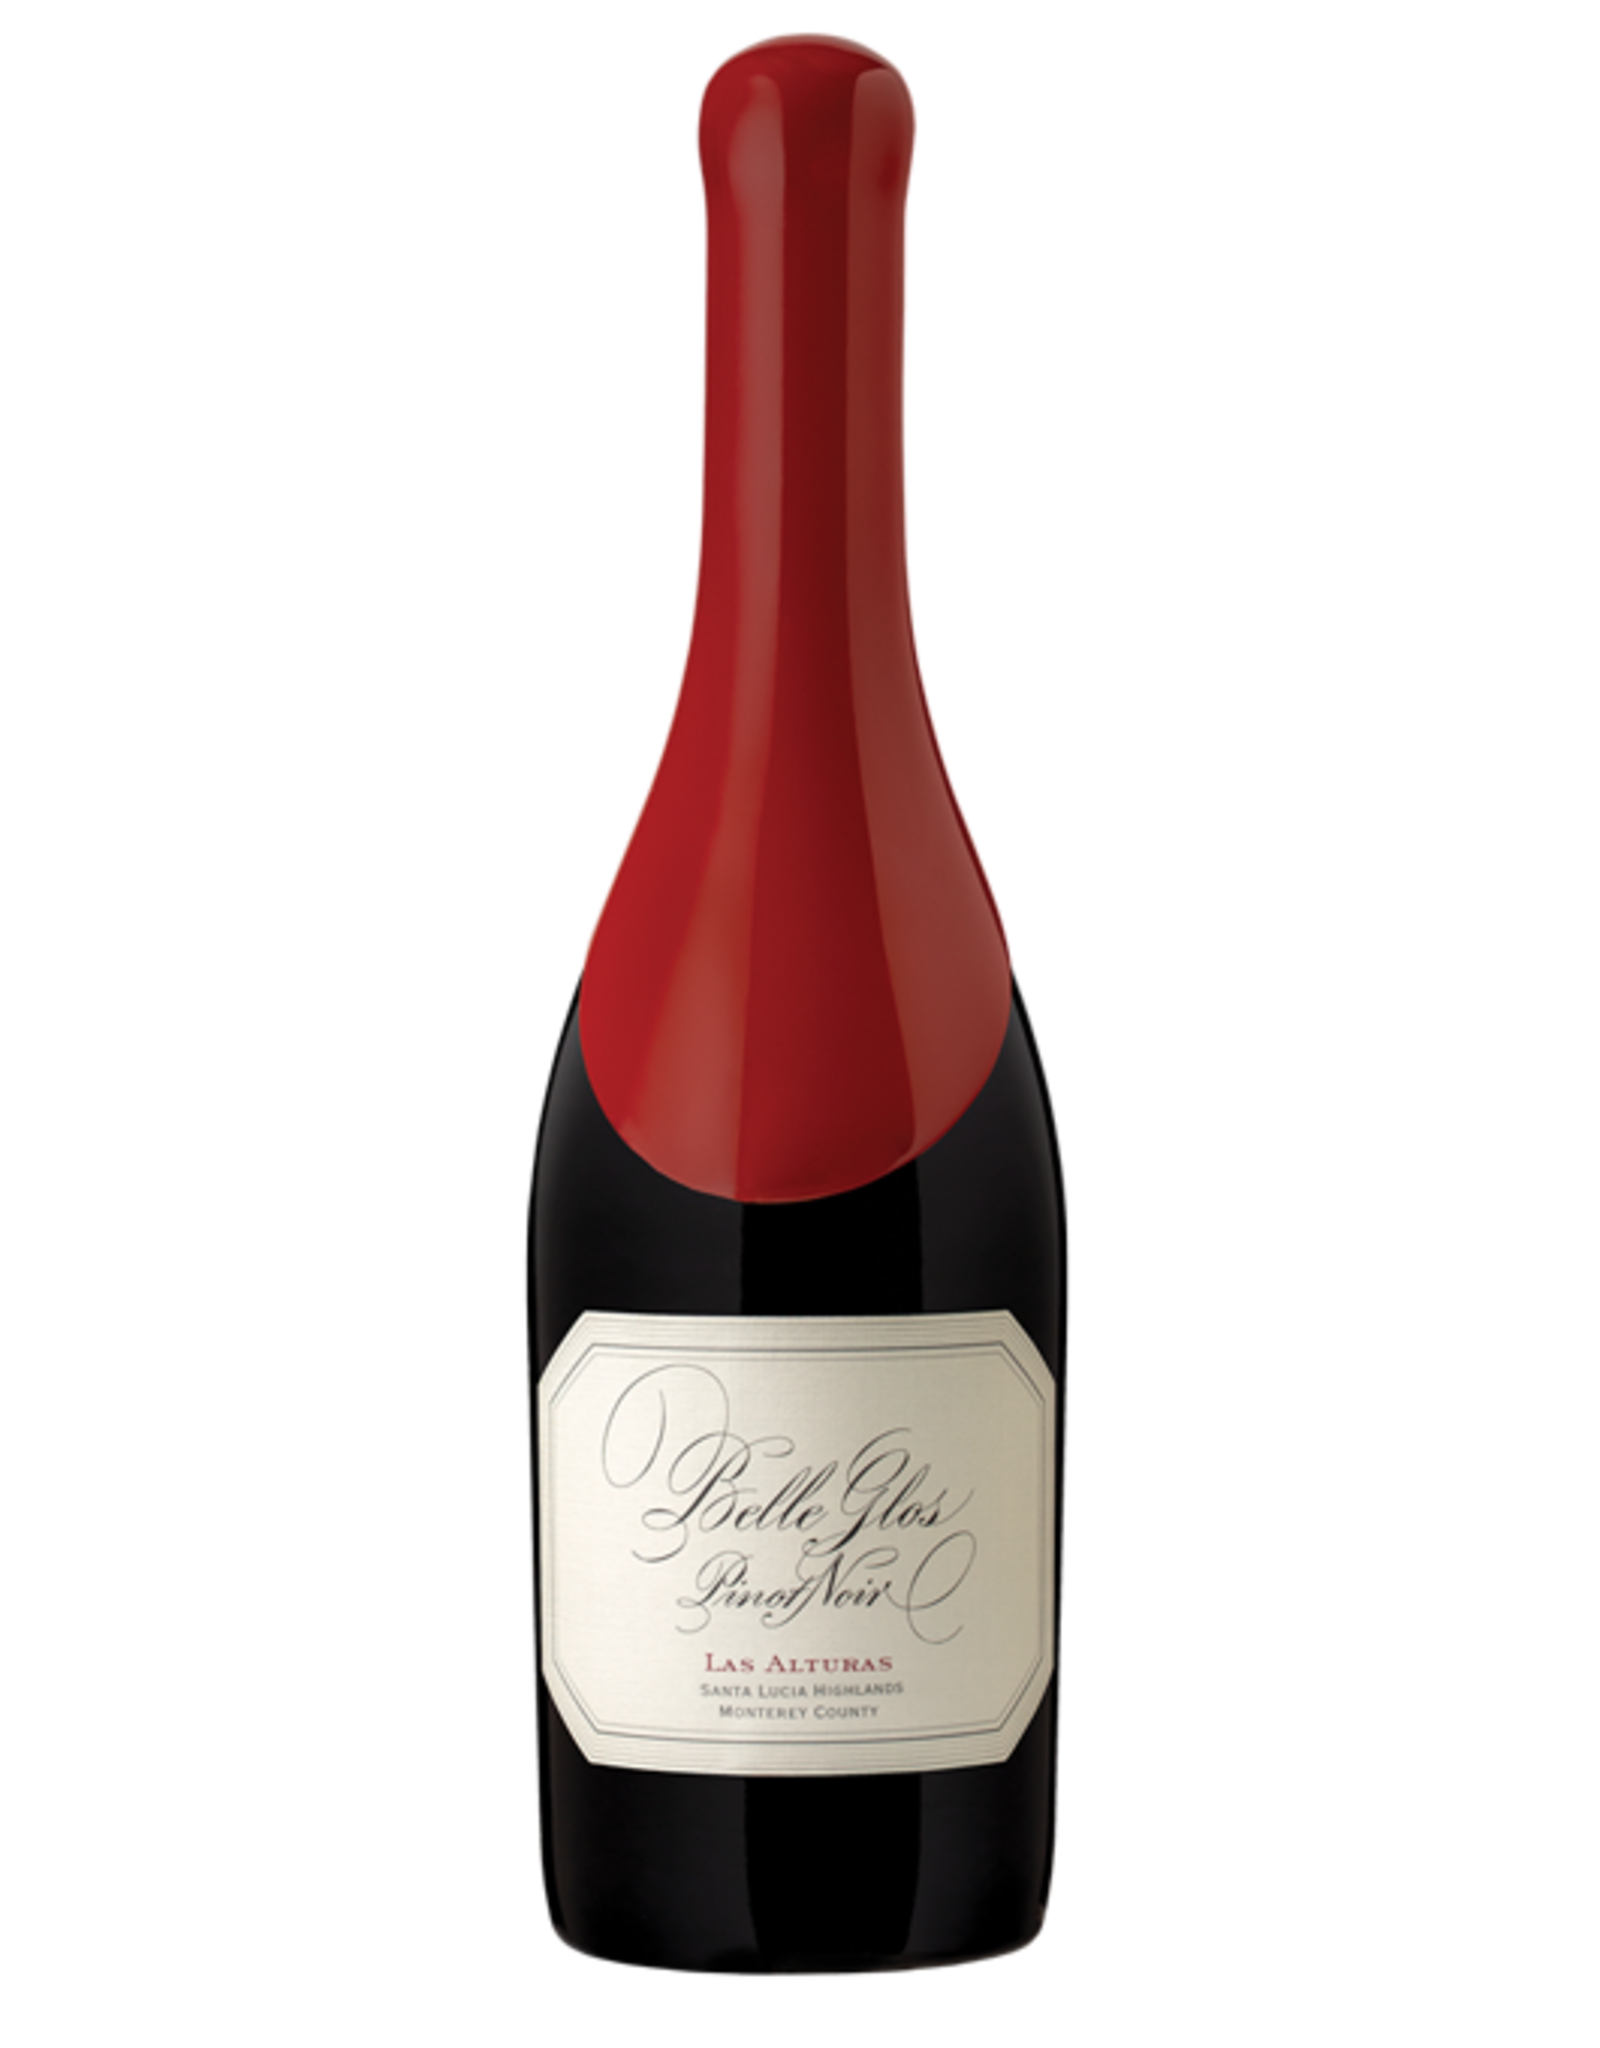 Belle Glos Las Alturas Pinot Noir 2019